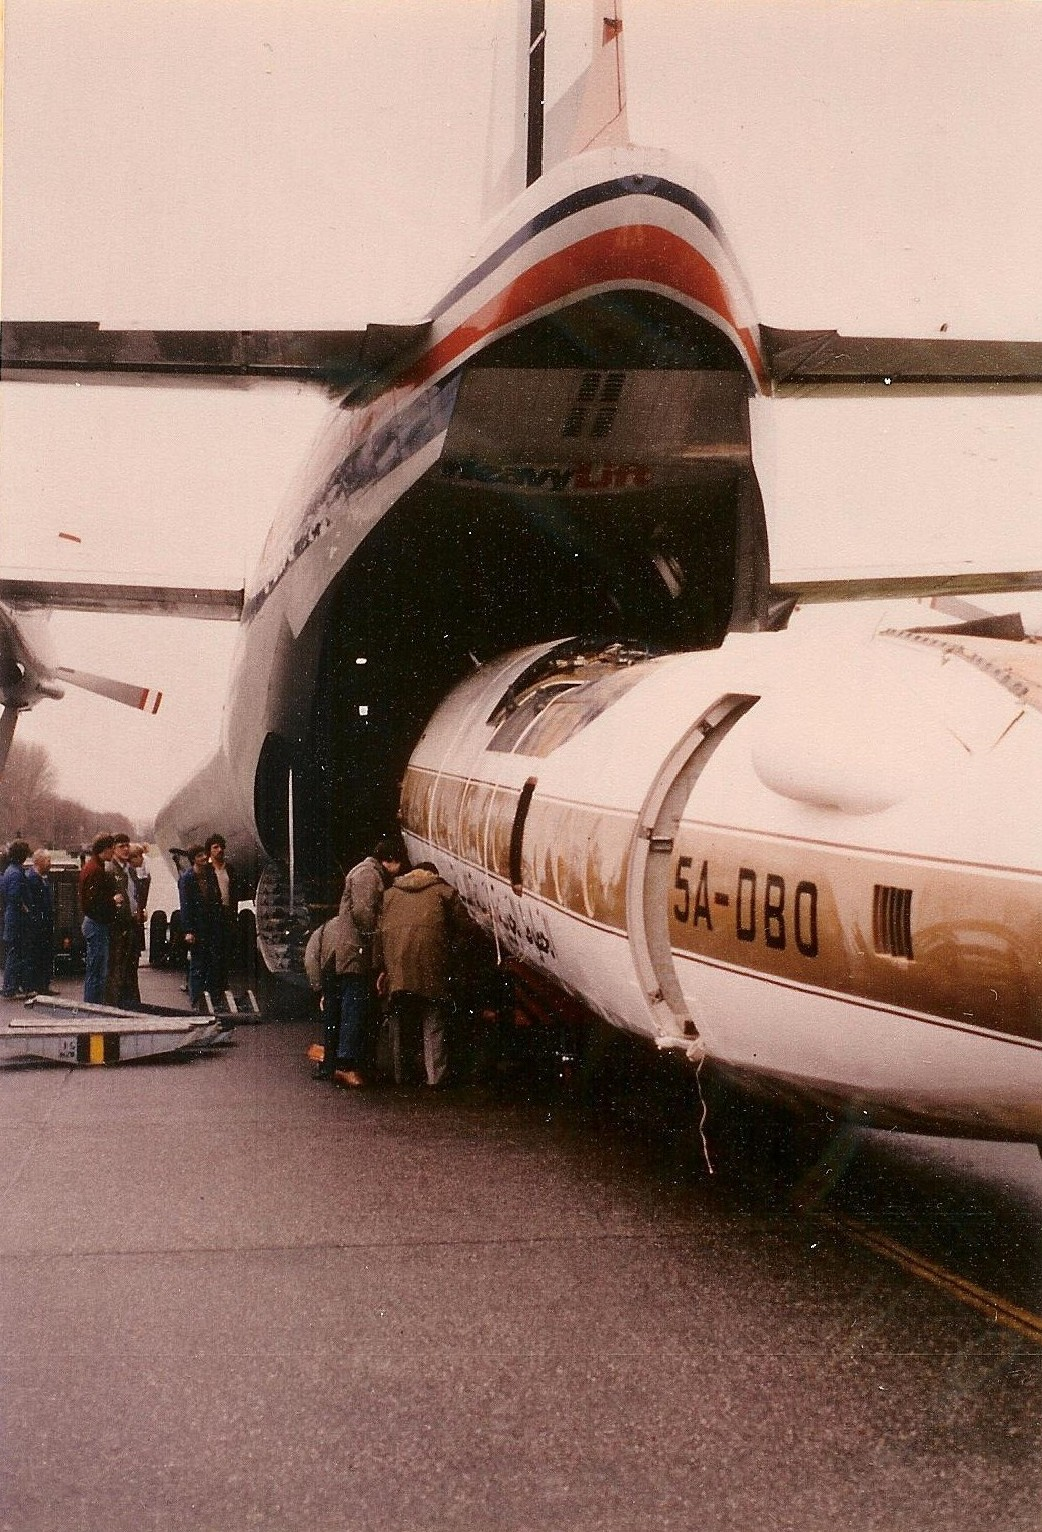 Naam: Ypenburg Short Belfaster, F-413 5A-DBO wordt uit geladen.jpg Bekeken: 92 Grootte: 483,4 KB